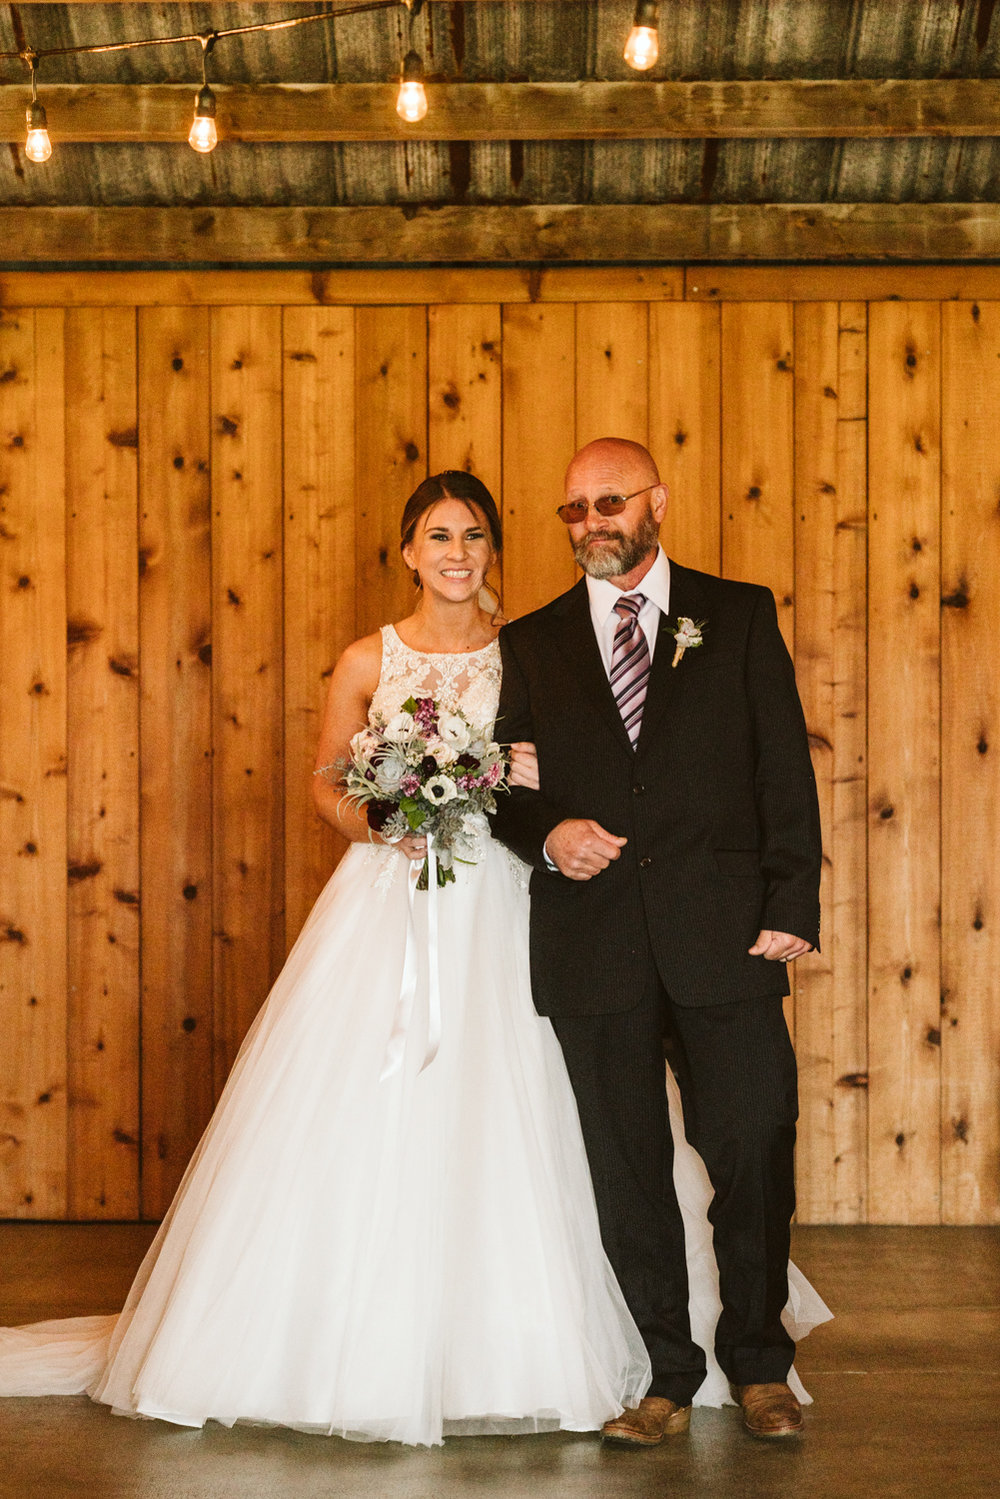 April Yentas Photography - jen and anthony wedding-44.jpg